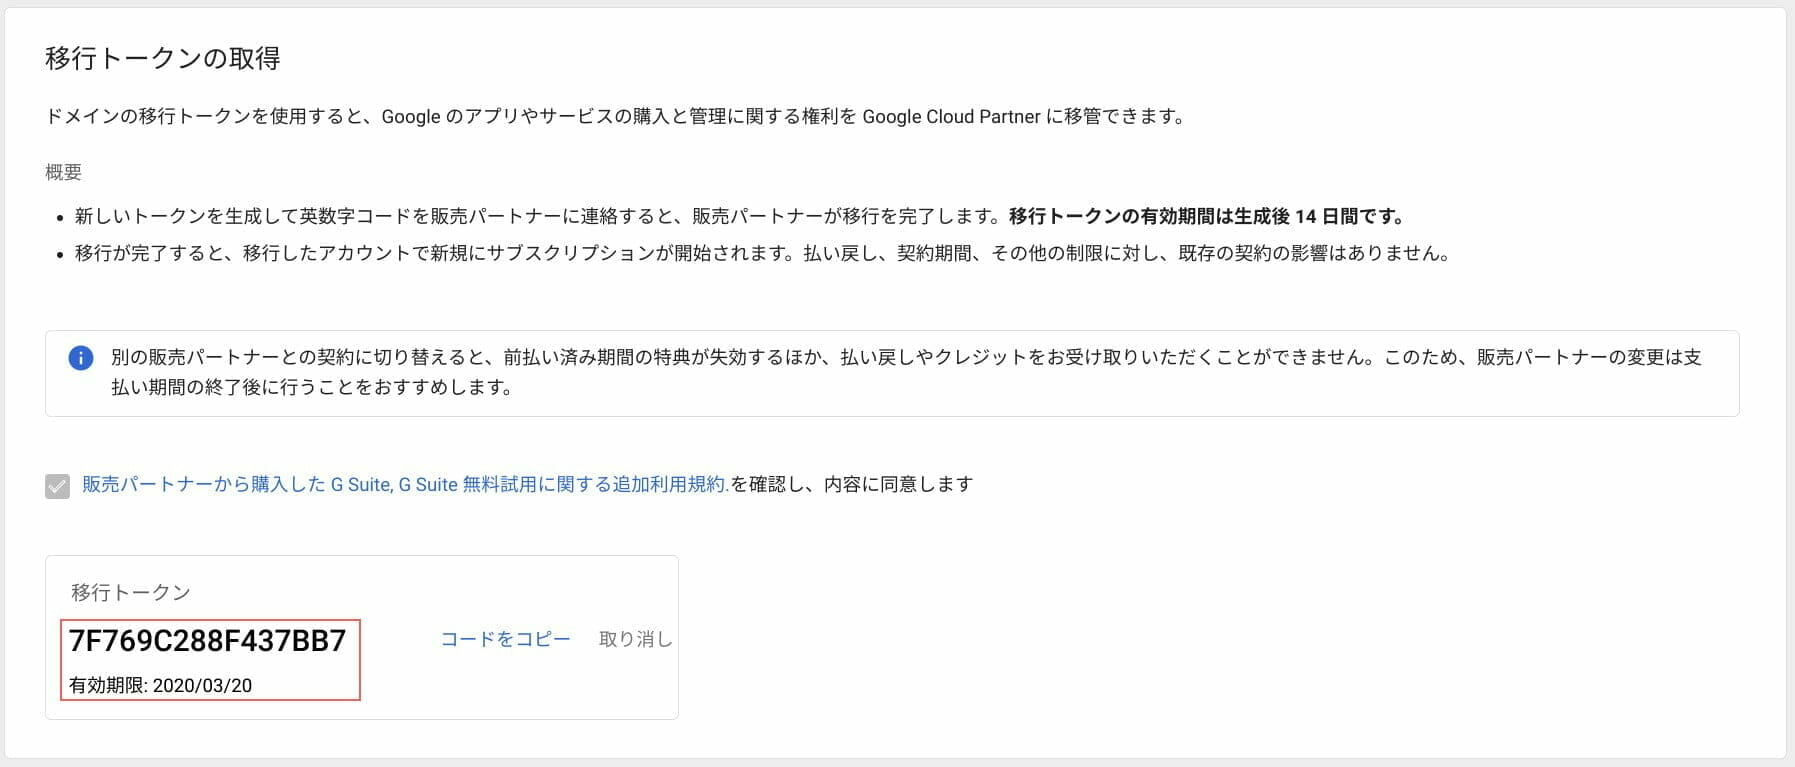 Google Admin:移行トークンの生成完了